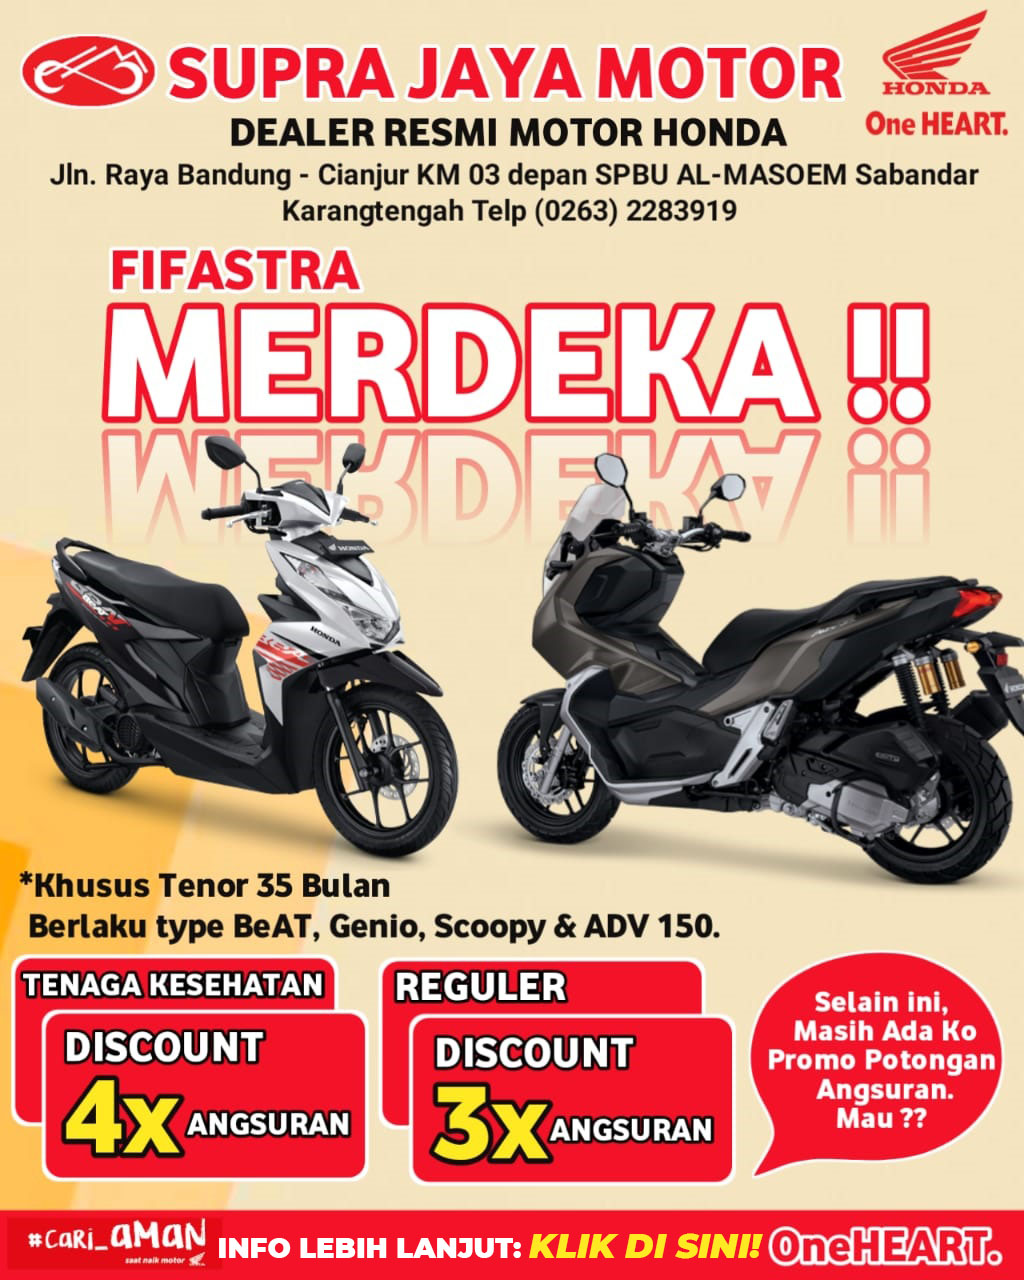 Supra Jaya Motor